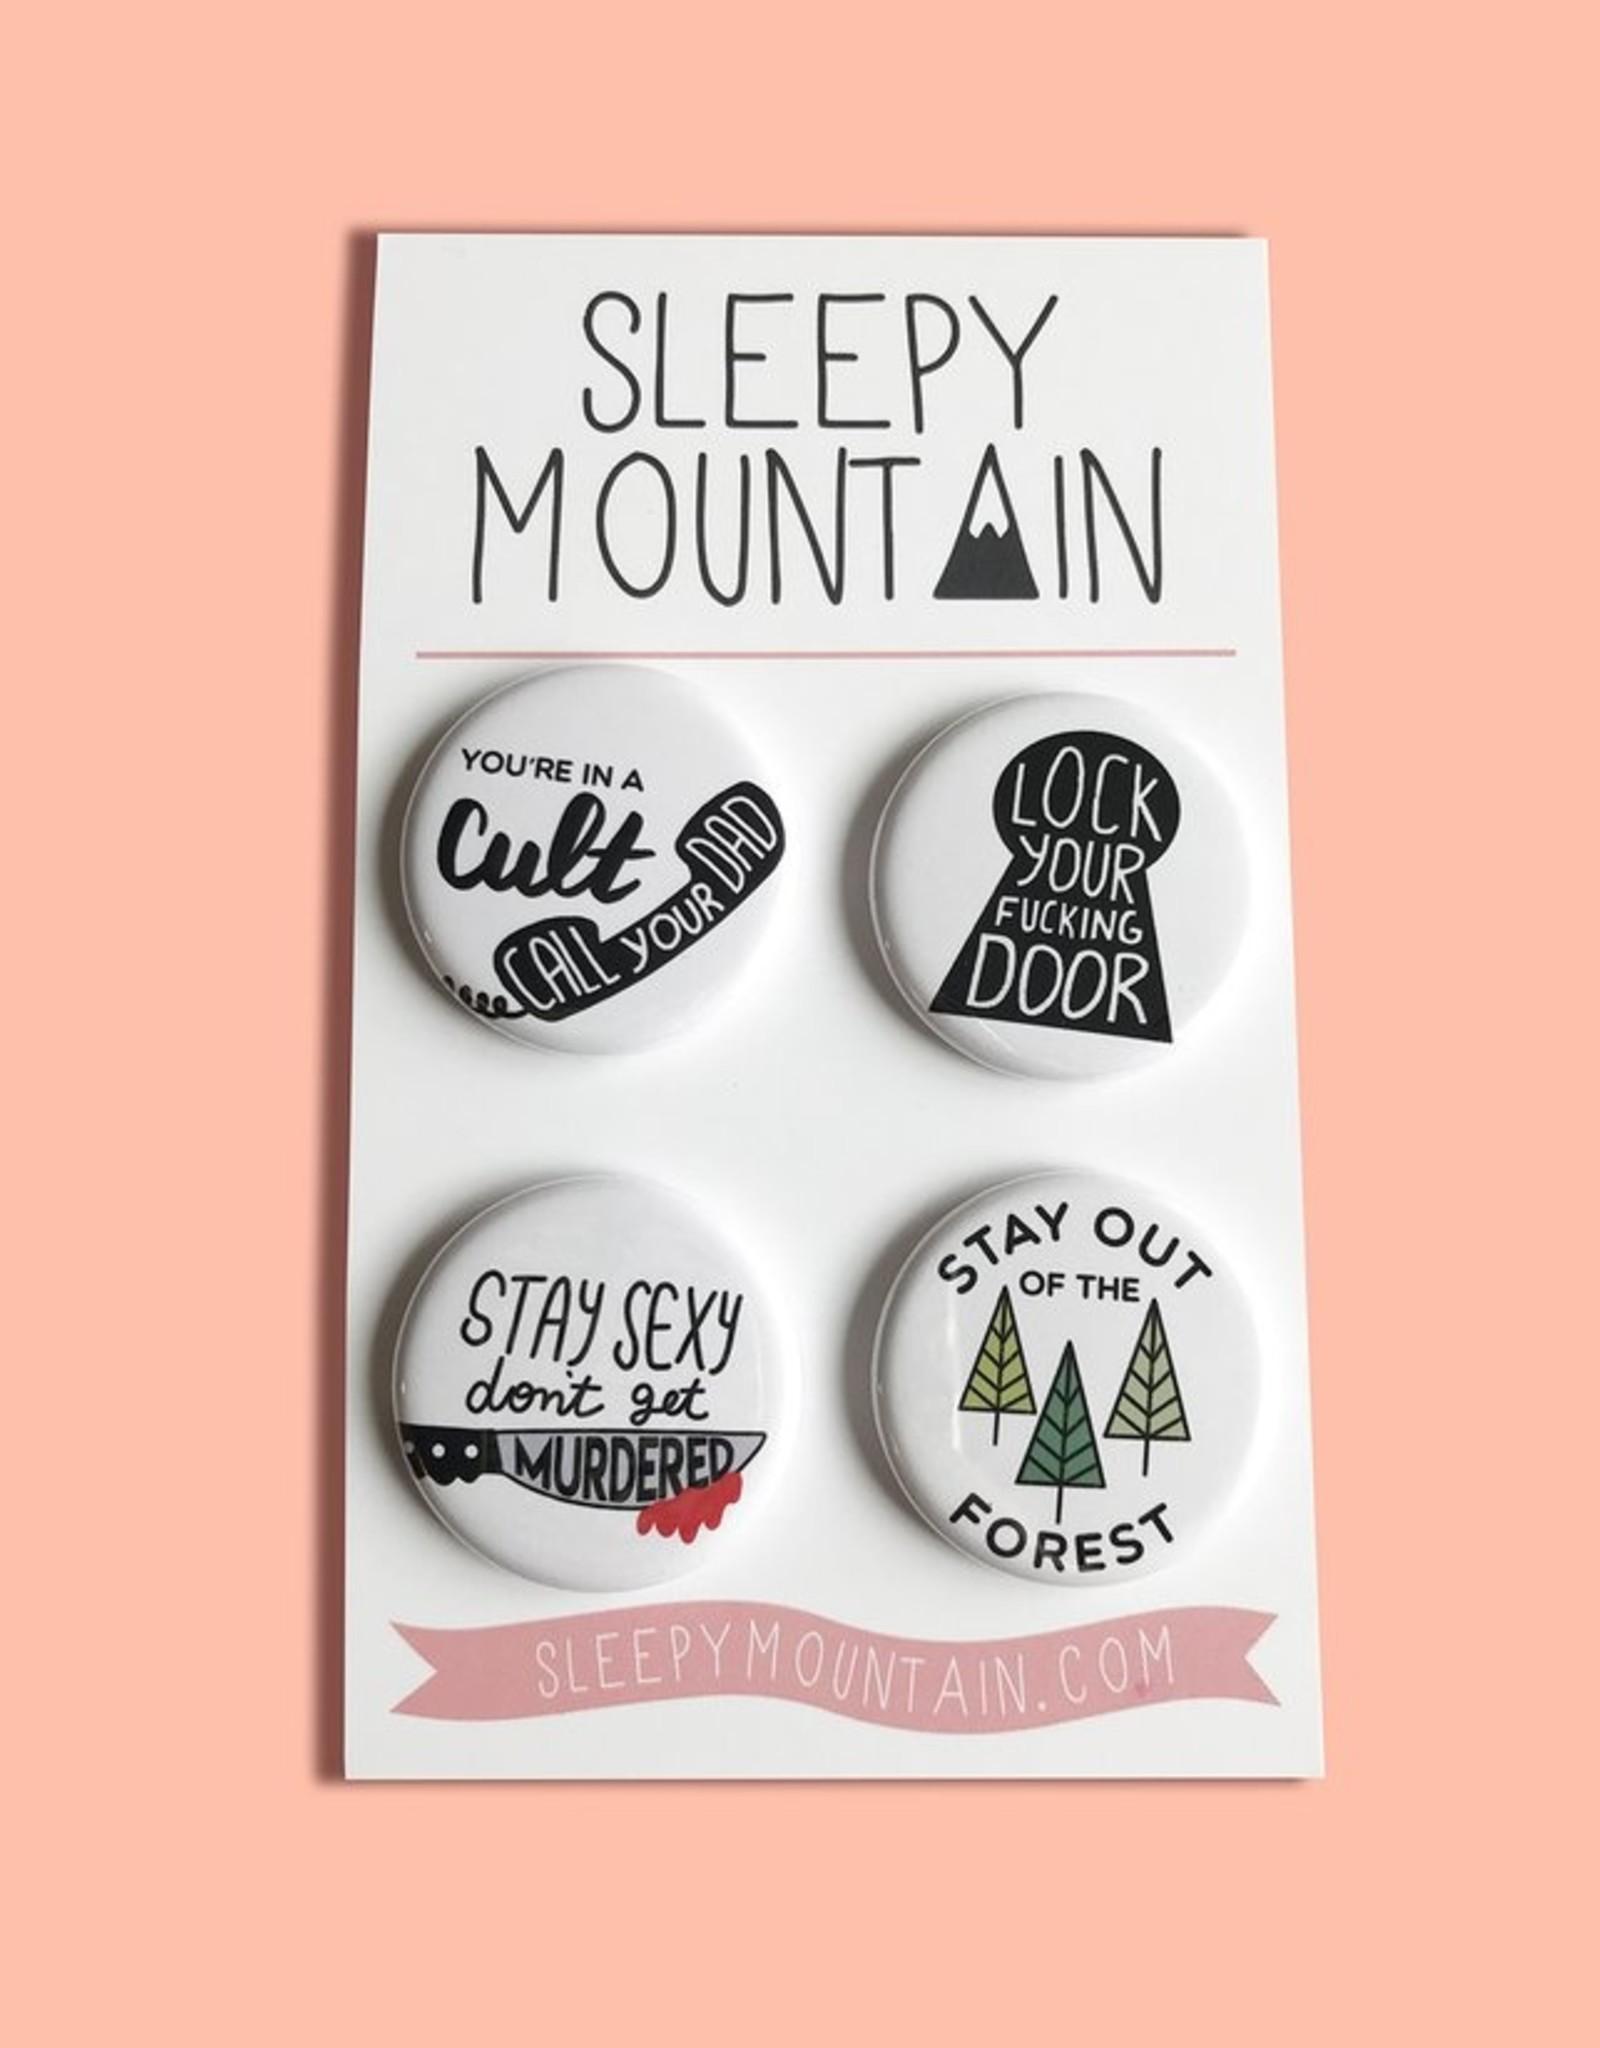 Sleepy Mountain Set of 4 Buttons by Sleepy Mountain